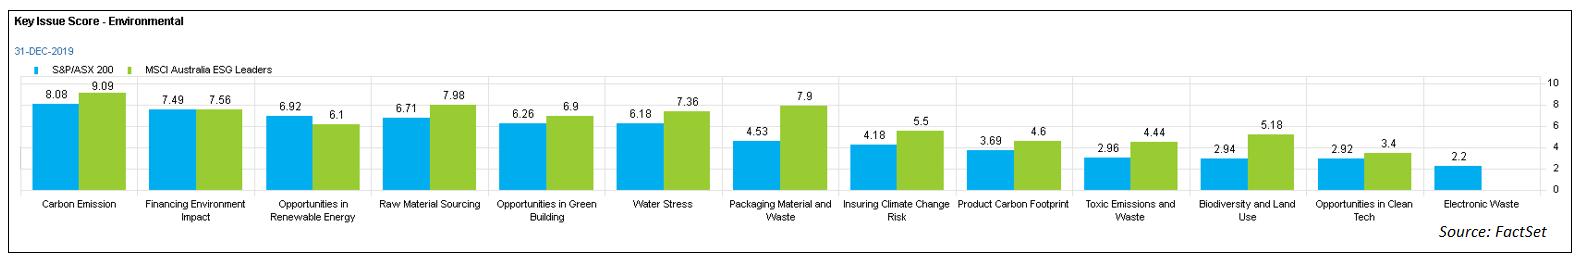 Key Issue Score - Environmental